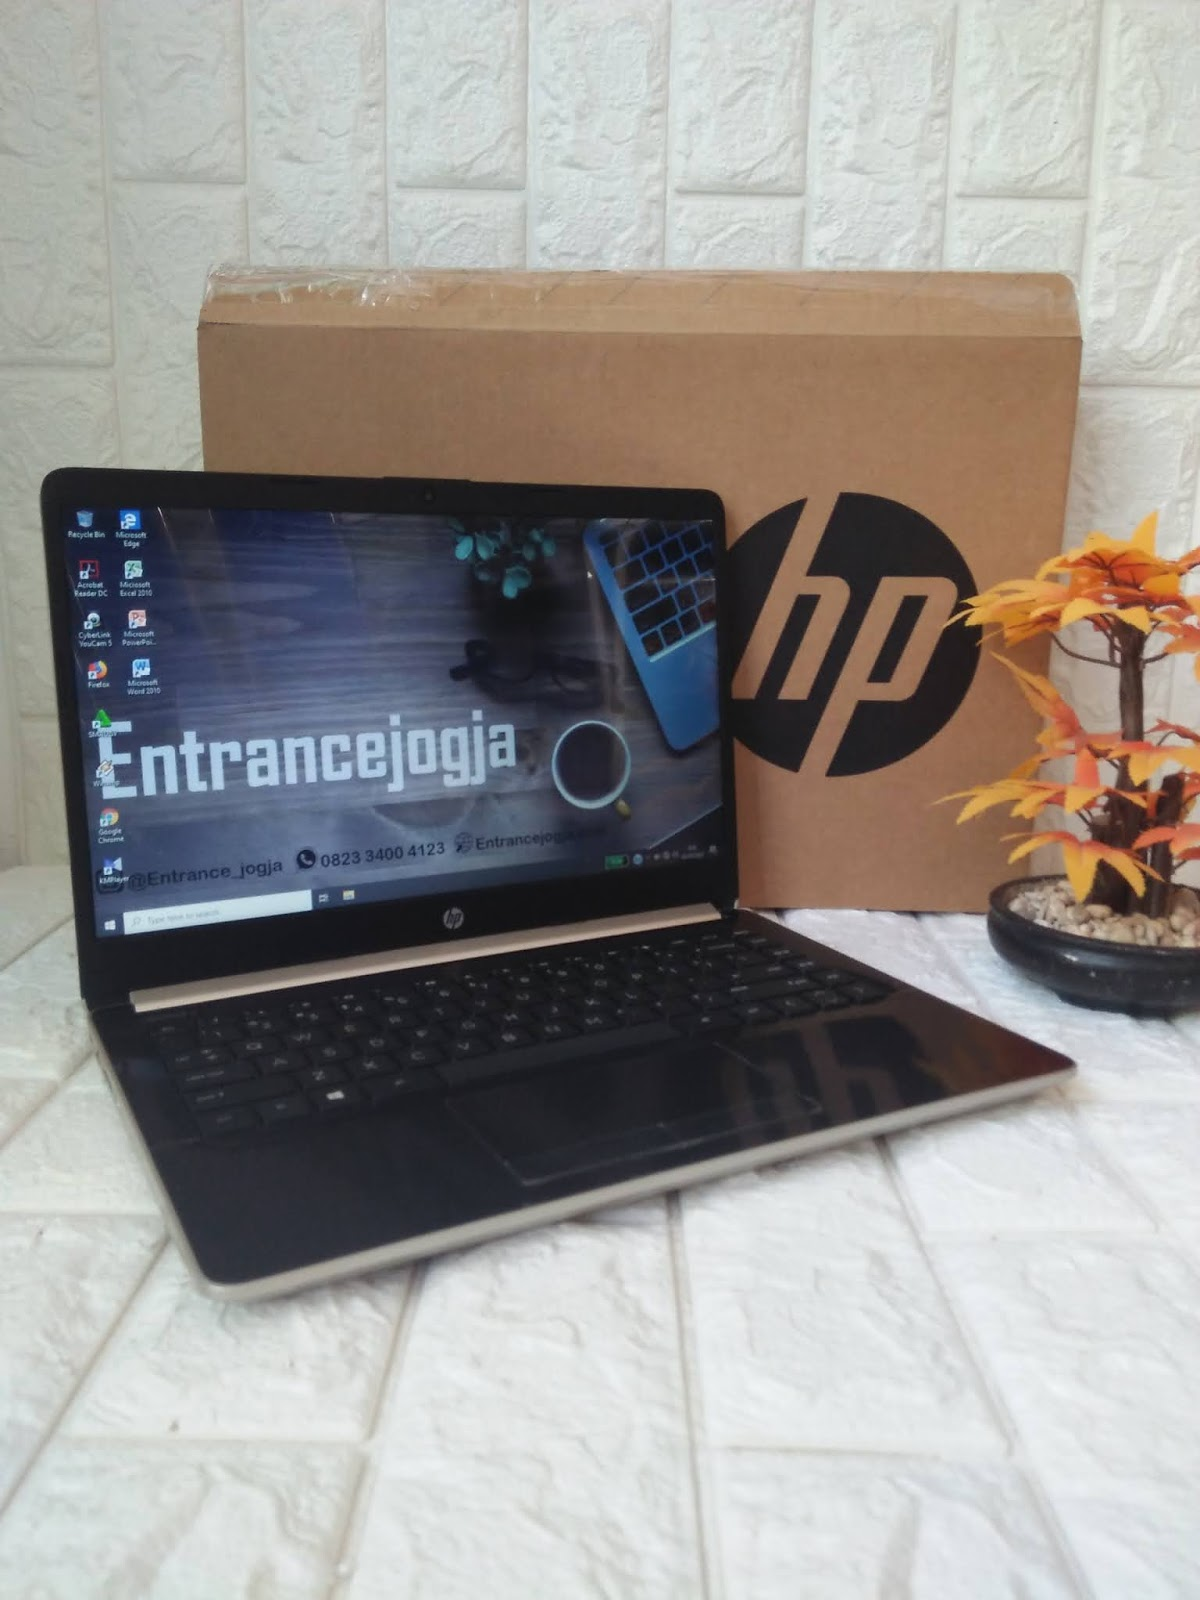 Jual Beli Laptop Yogyakarta 0823 3400 4123 Laptop Hp 14s Dk0xxx Soldout